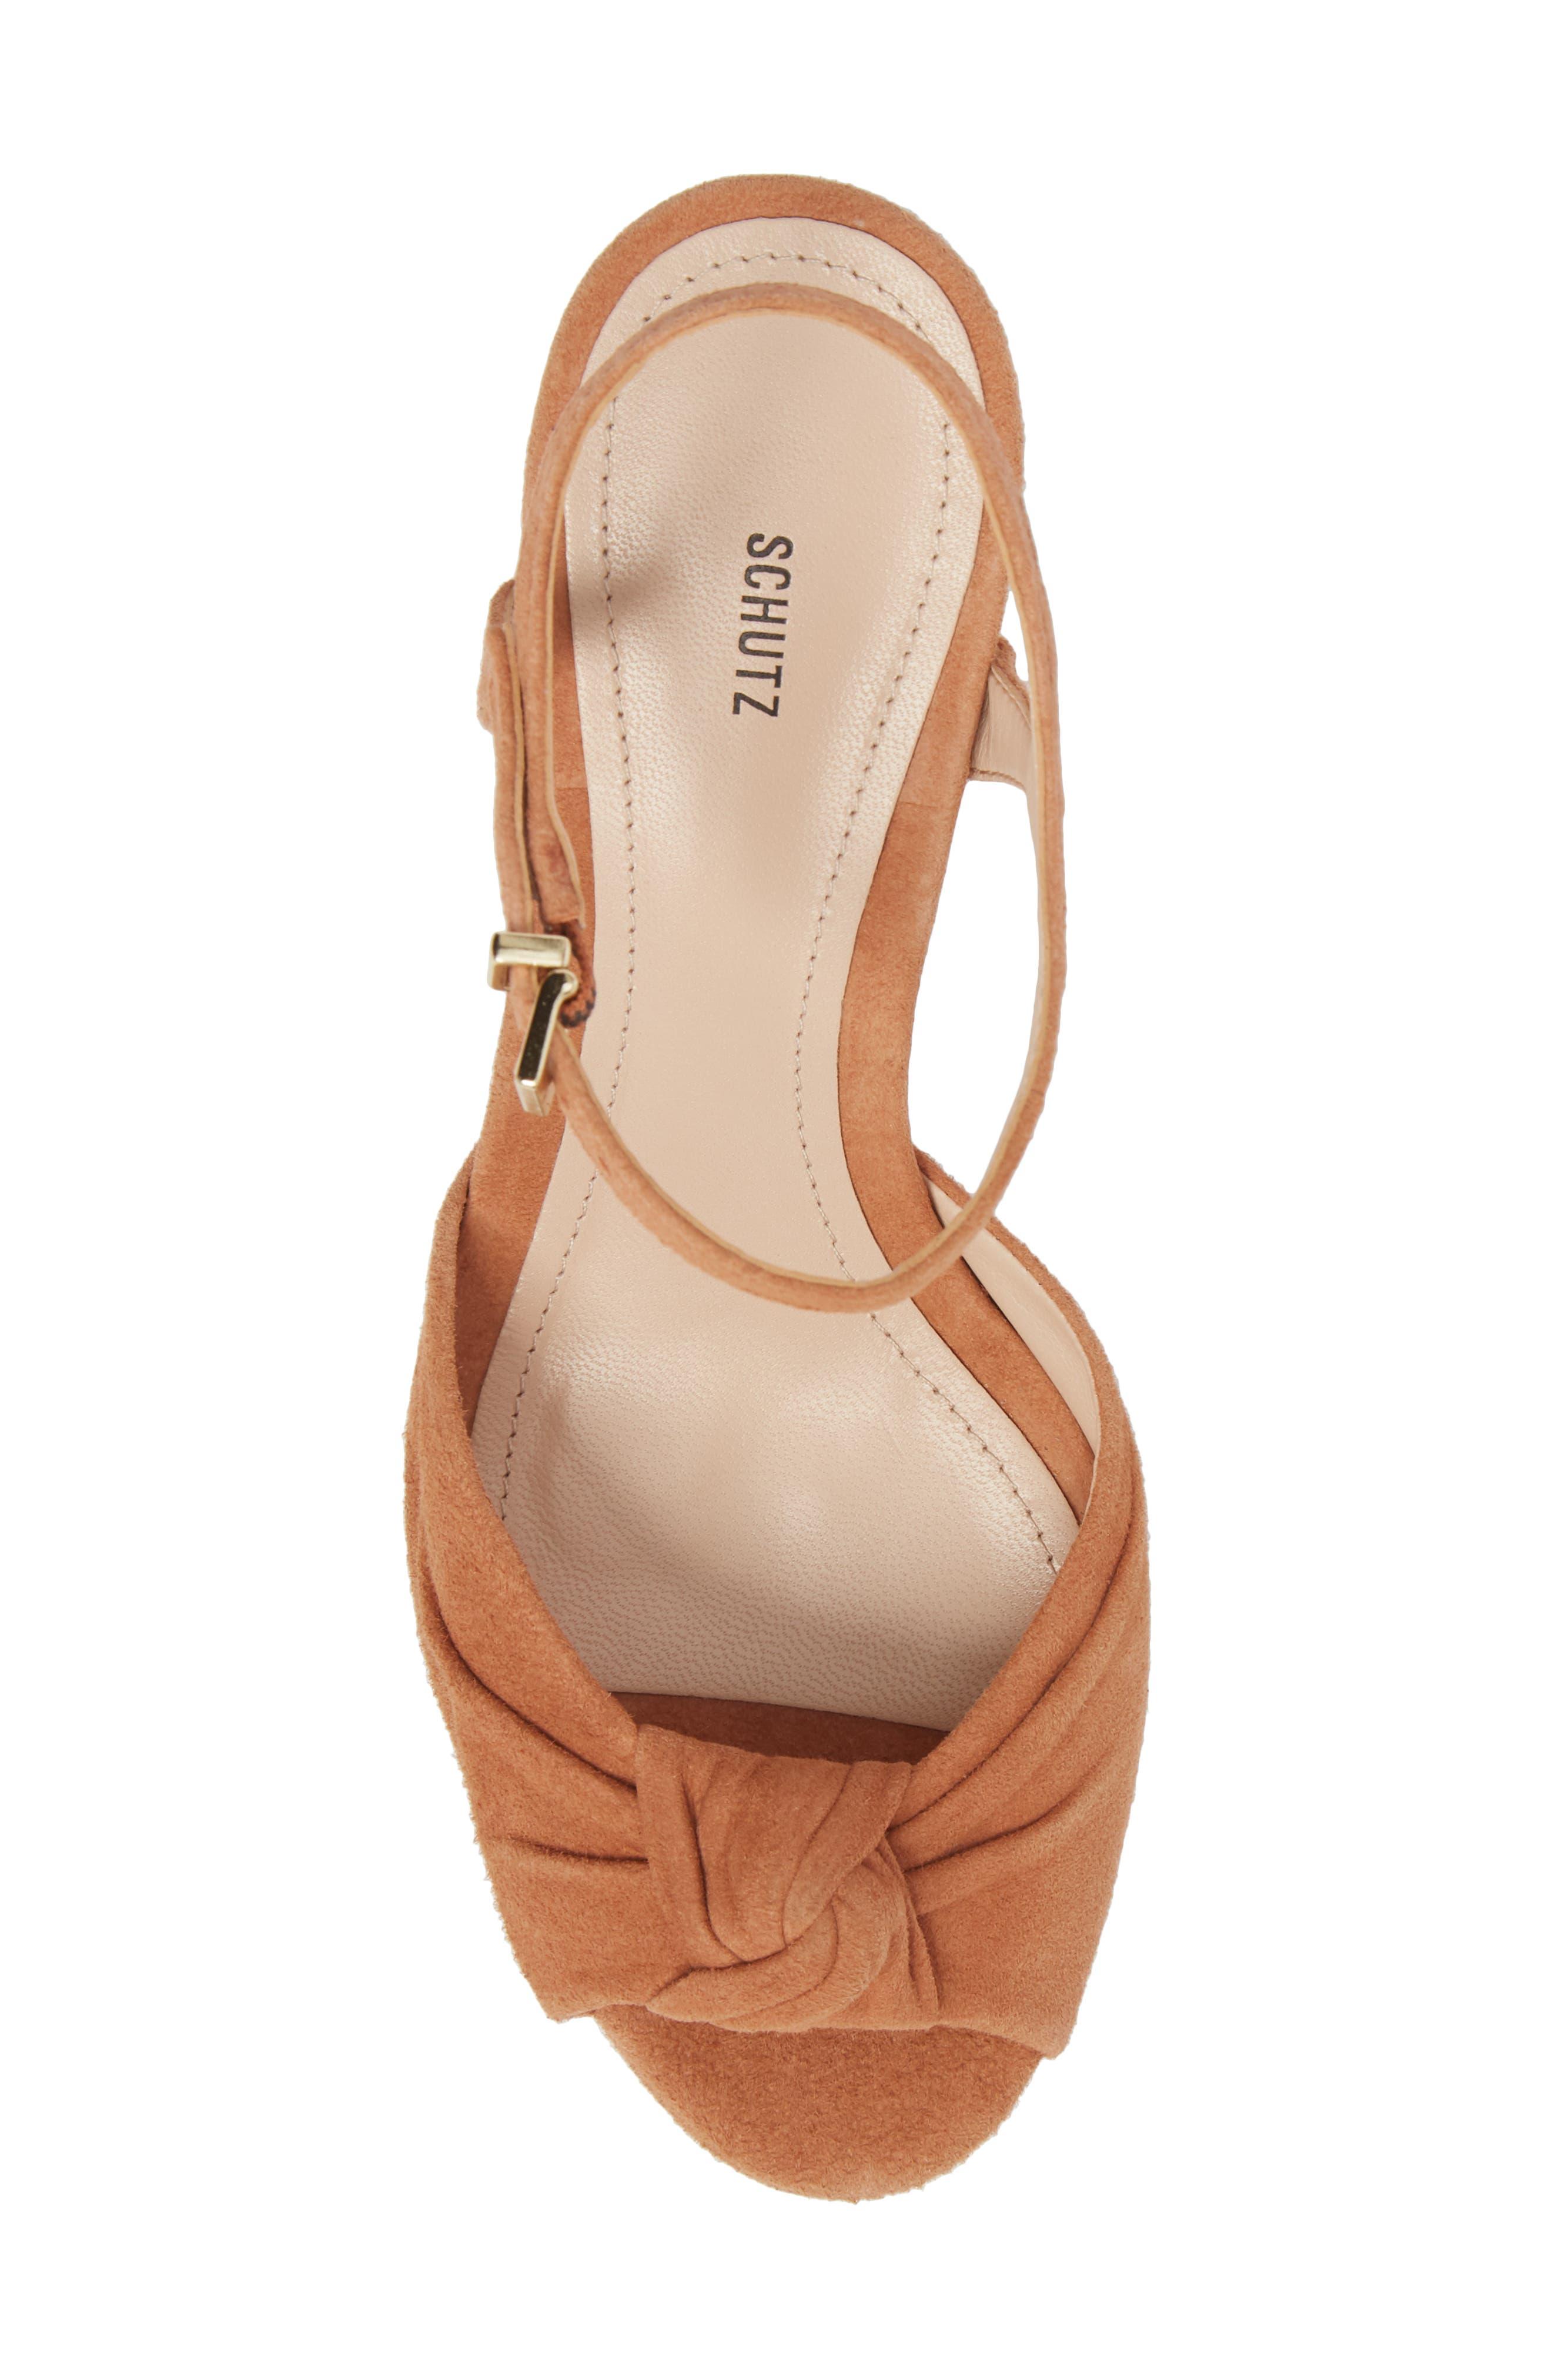 Thalyta Platform Sandal,                             Alternate thumbnail 5, color,                             Toasted Nut